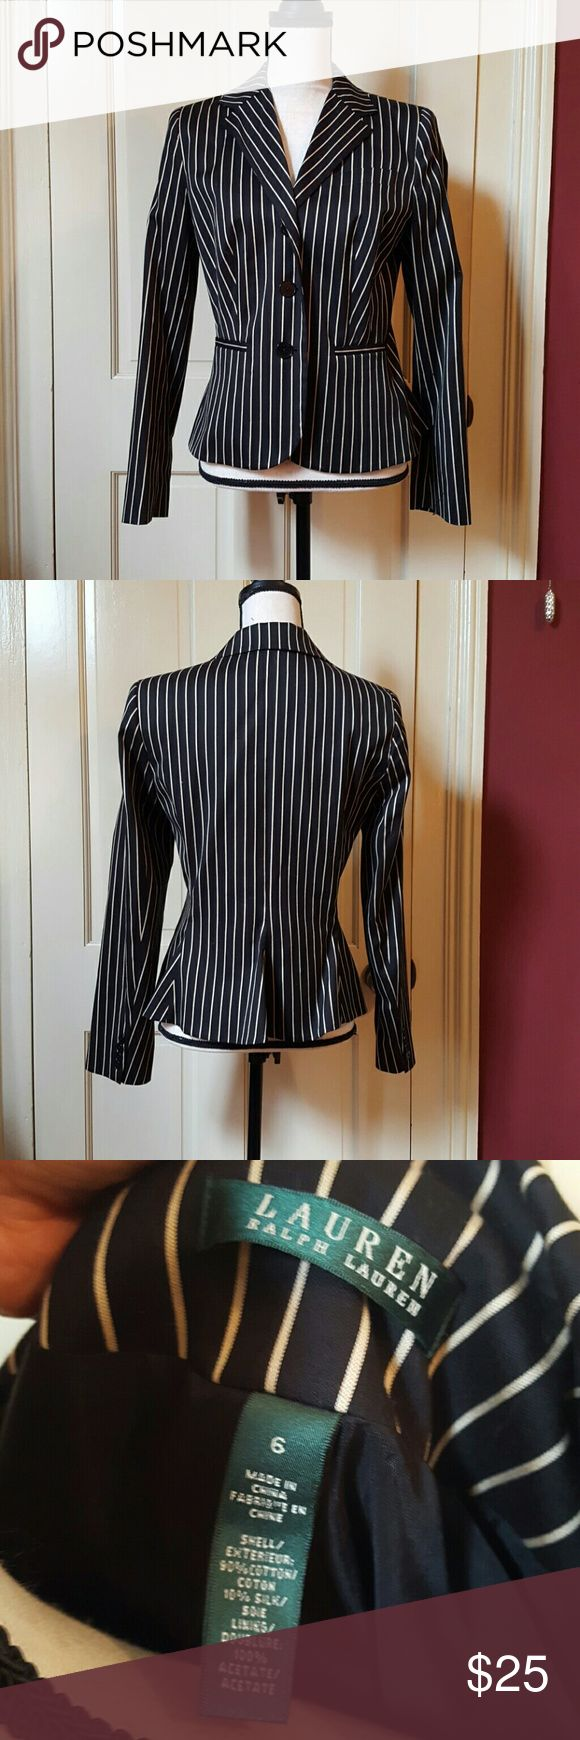 Black and white Lauren pin striped blazer Lauren by Ralph Lauren b & w pin striped blazer 6 Lauren Ralph Lauren Jackets & Coats Blazers